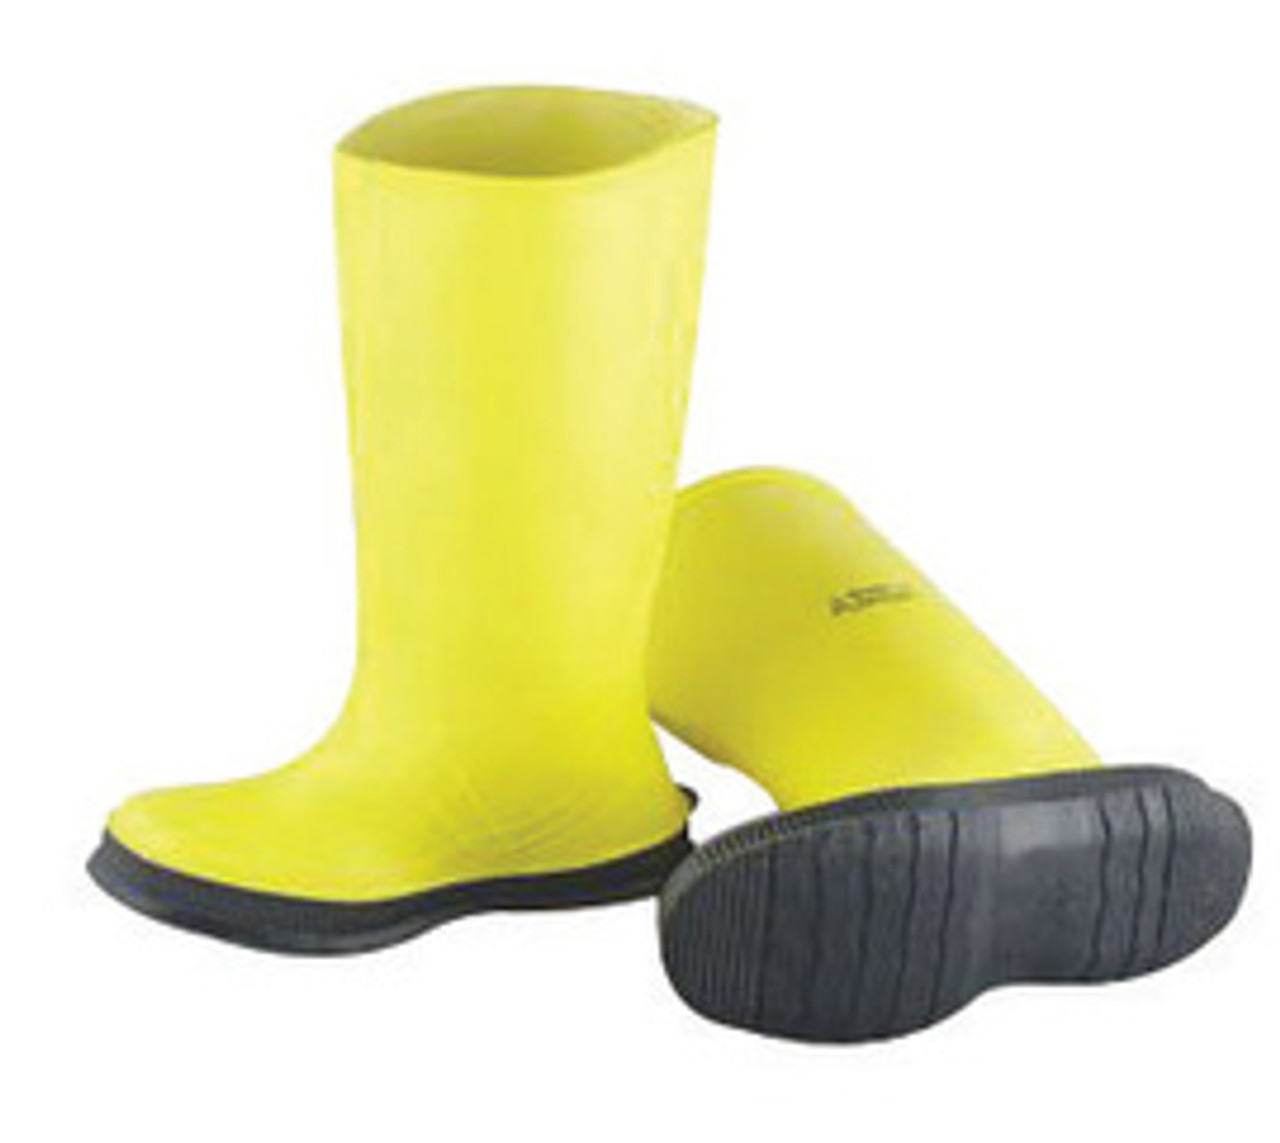 fb36991d0c538 88060-09 Bata Shoe Footwear